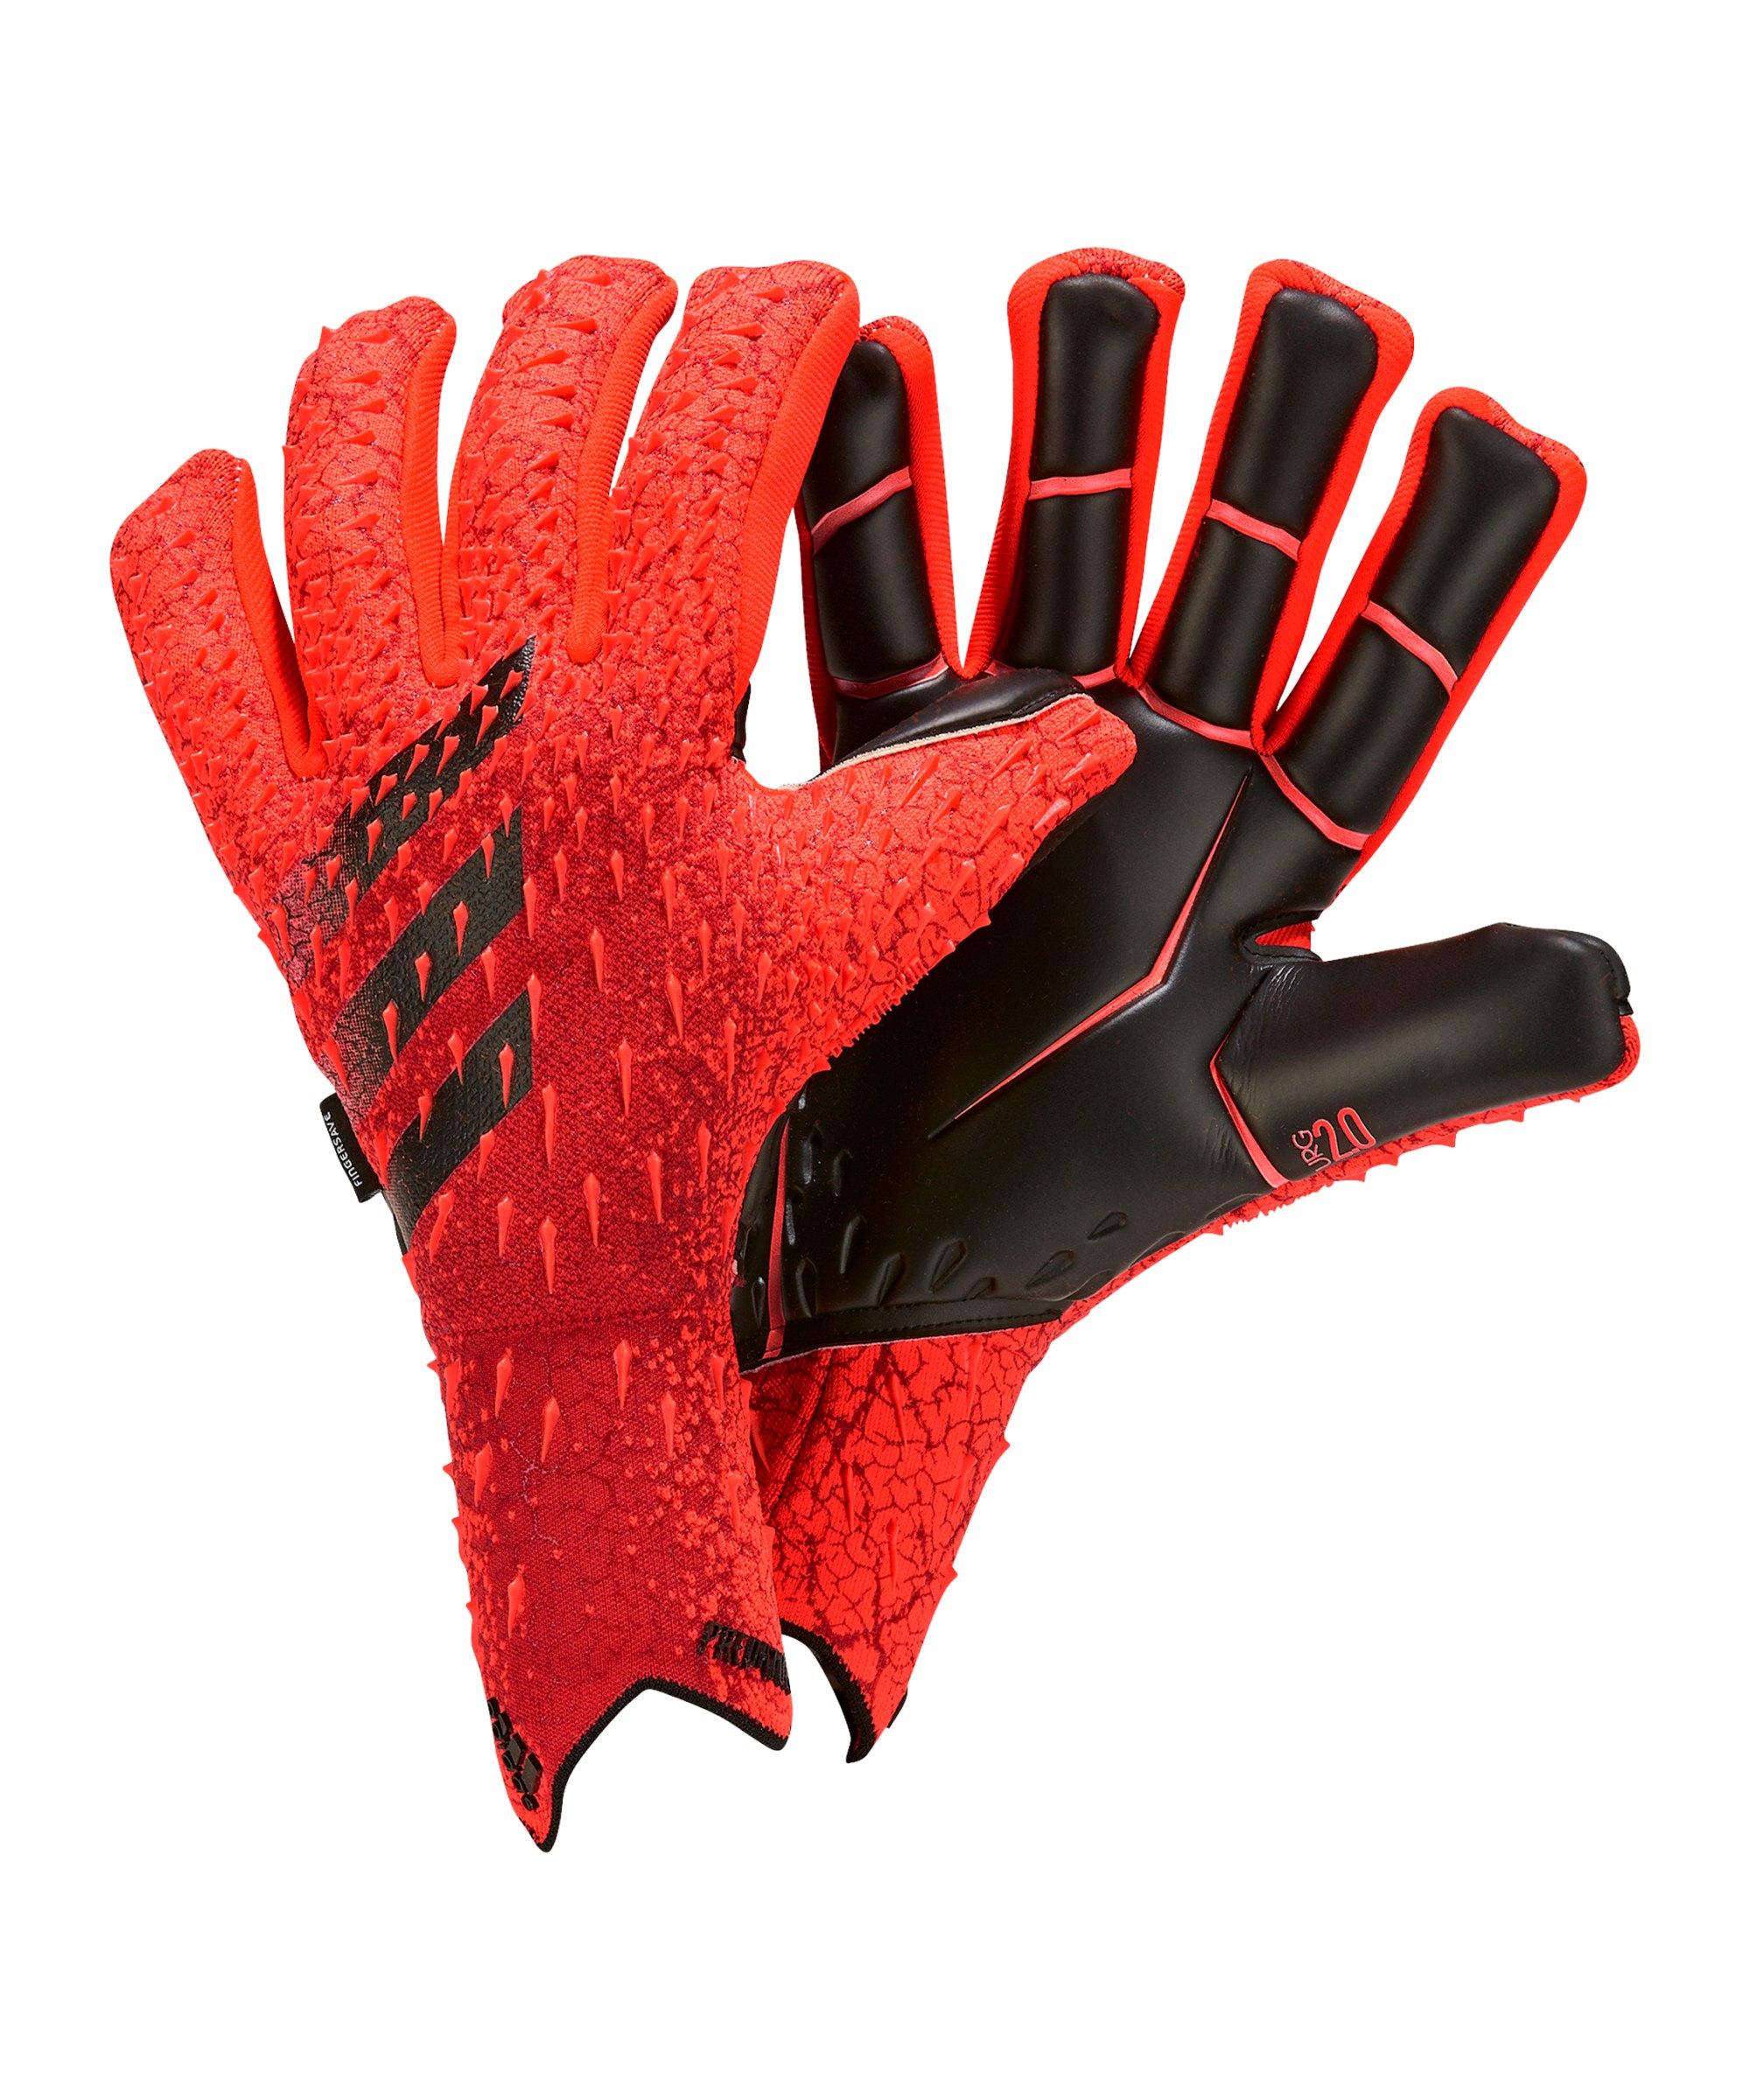 adidas Predator Pro FS Meteorite Torwarthandschuh Rot - rot